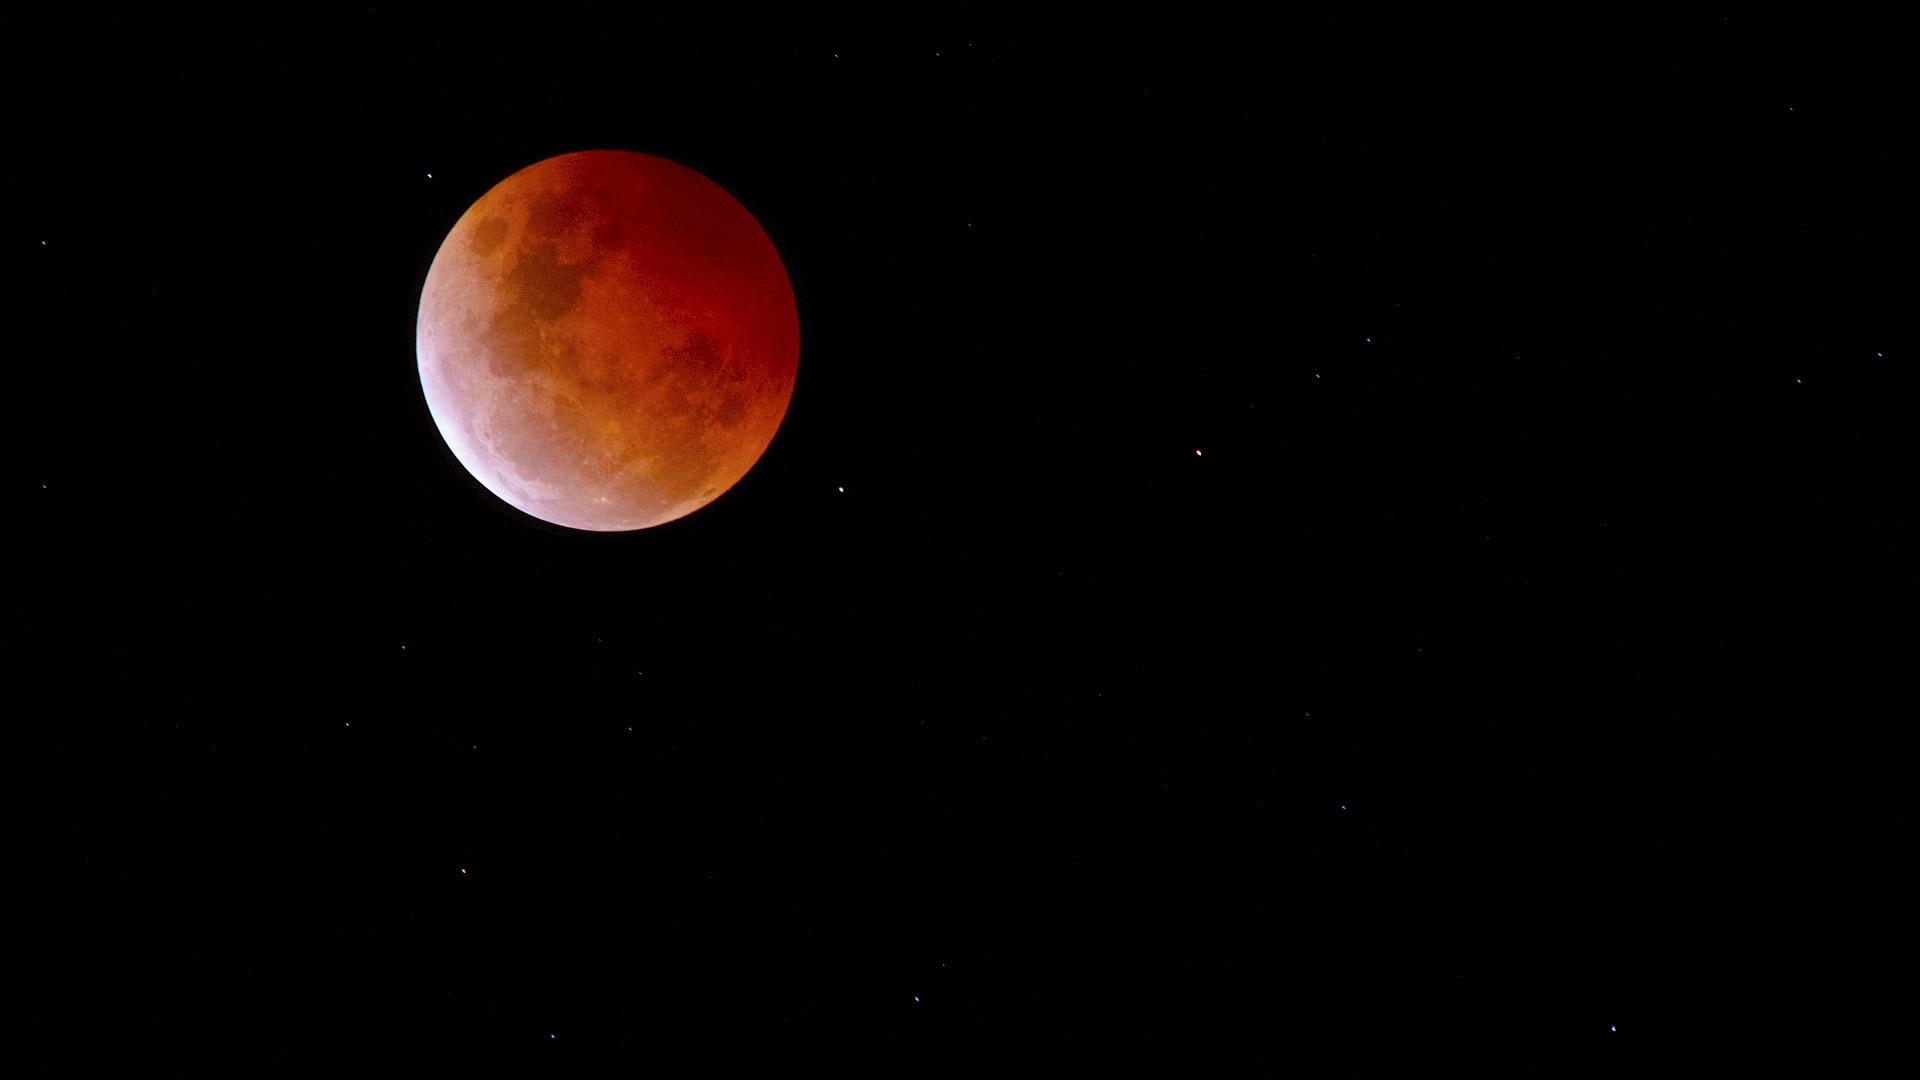 lunar eclipse december 29 2019 astrology in india